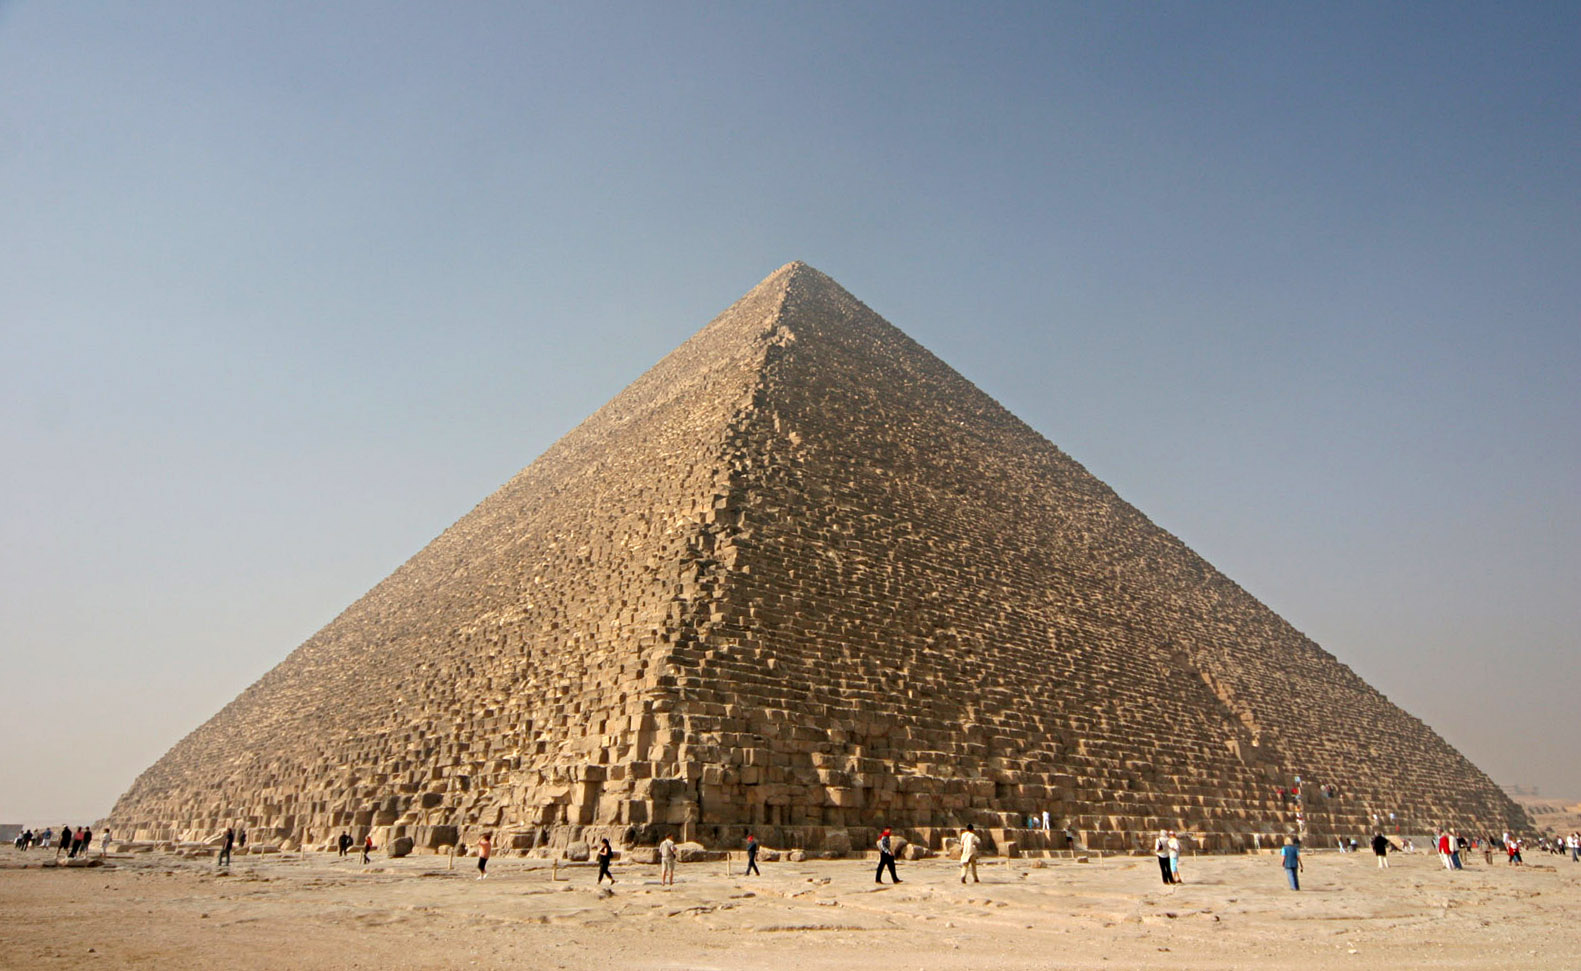 The 7 Wonders of the World [Original Ancient Wonders]